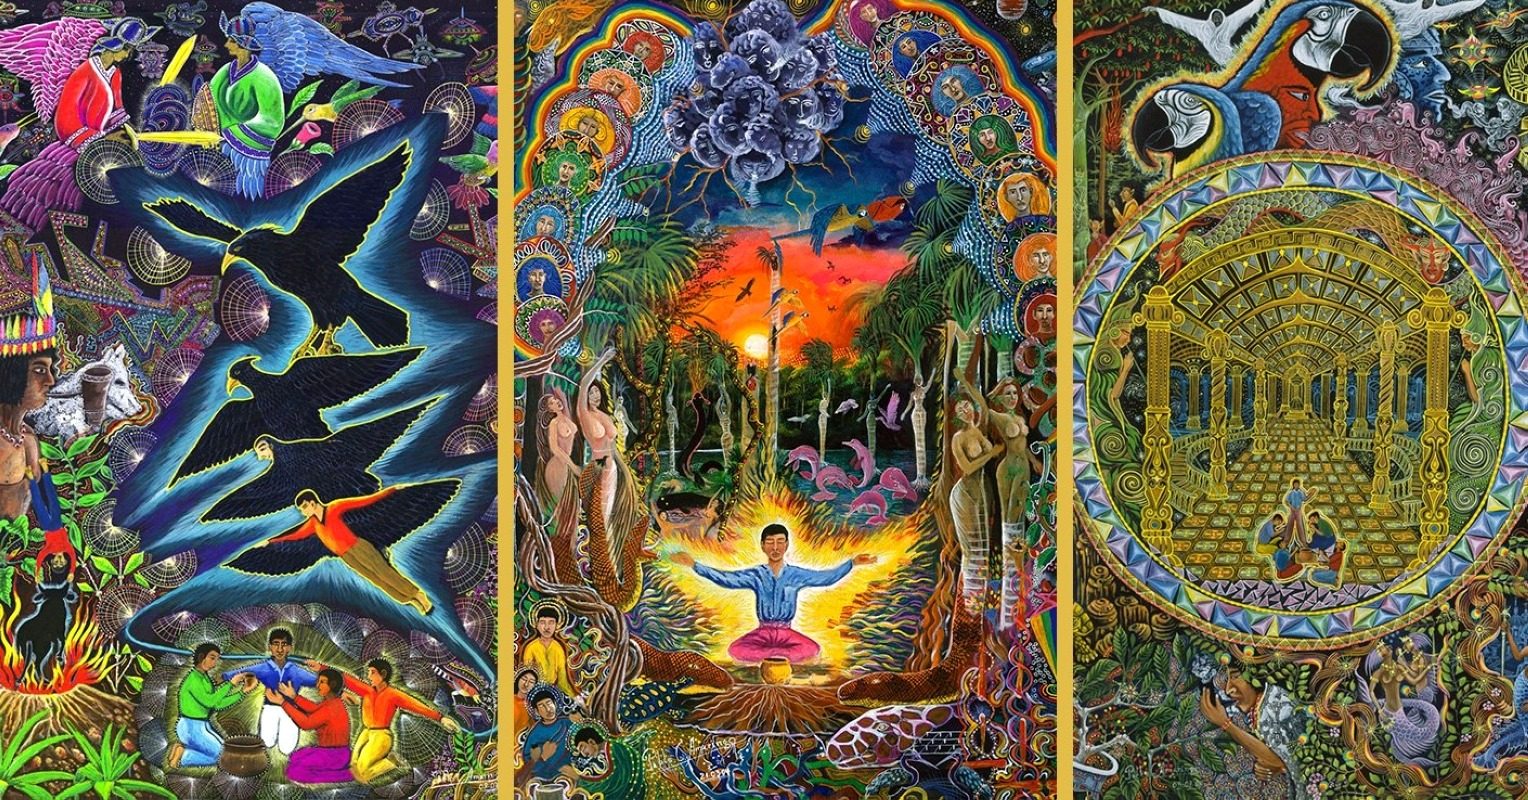 the-ayahuasca-visions-of-pablo-amaringo (45)